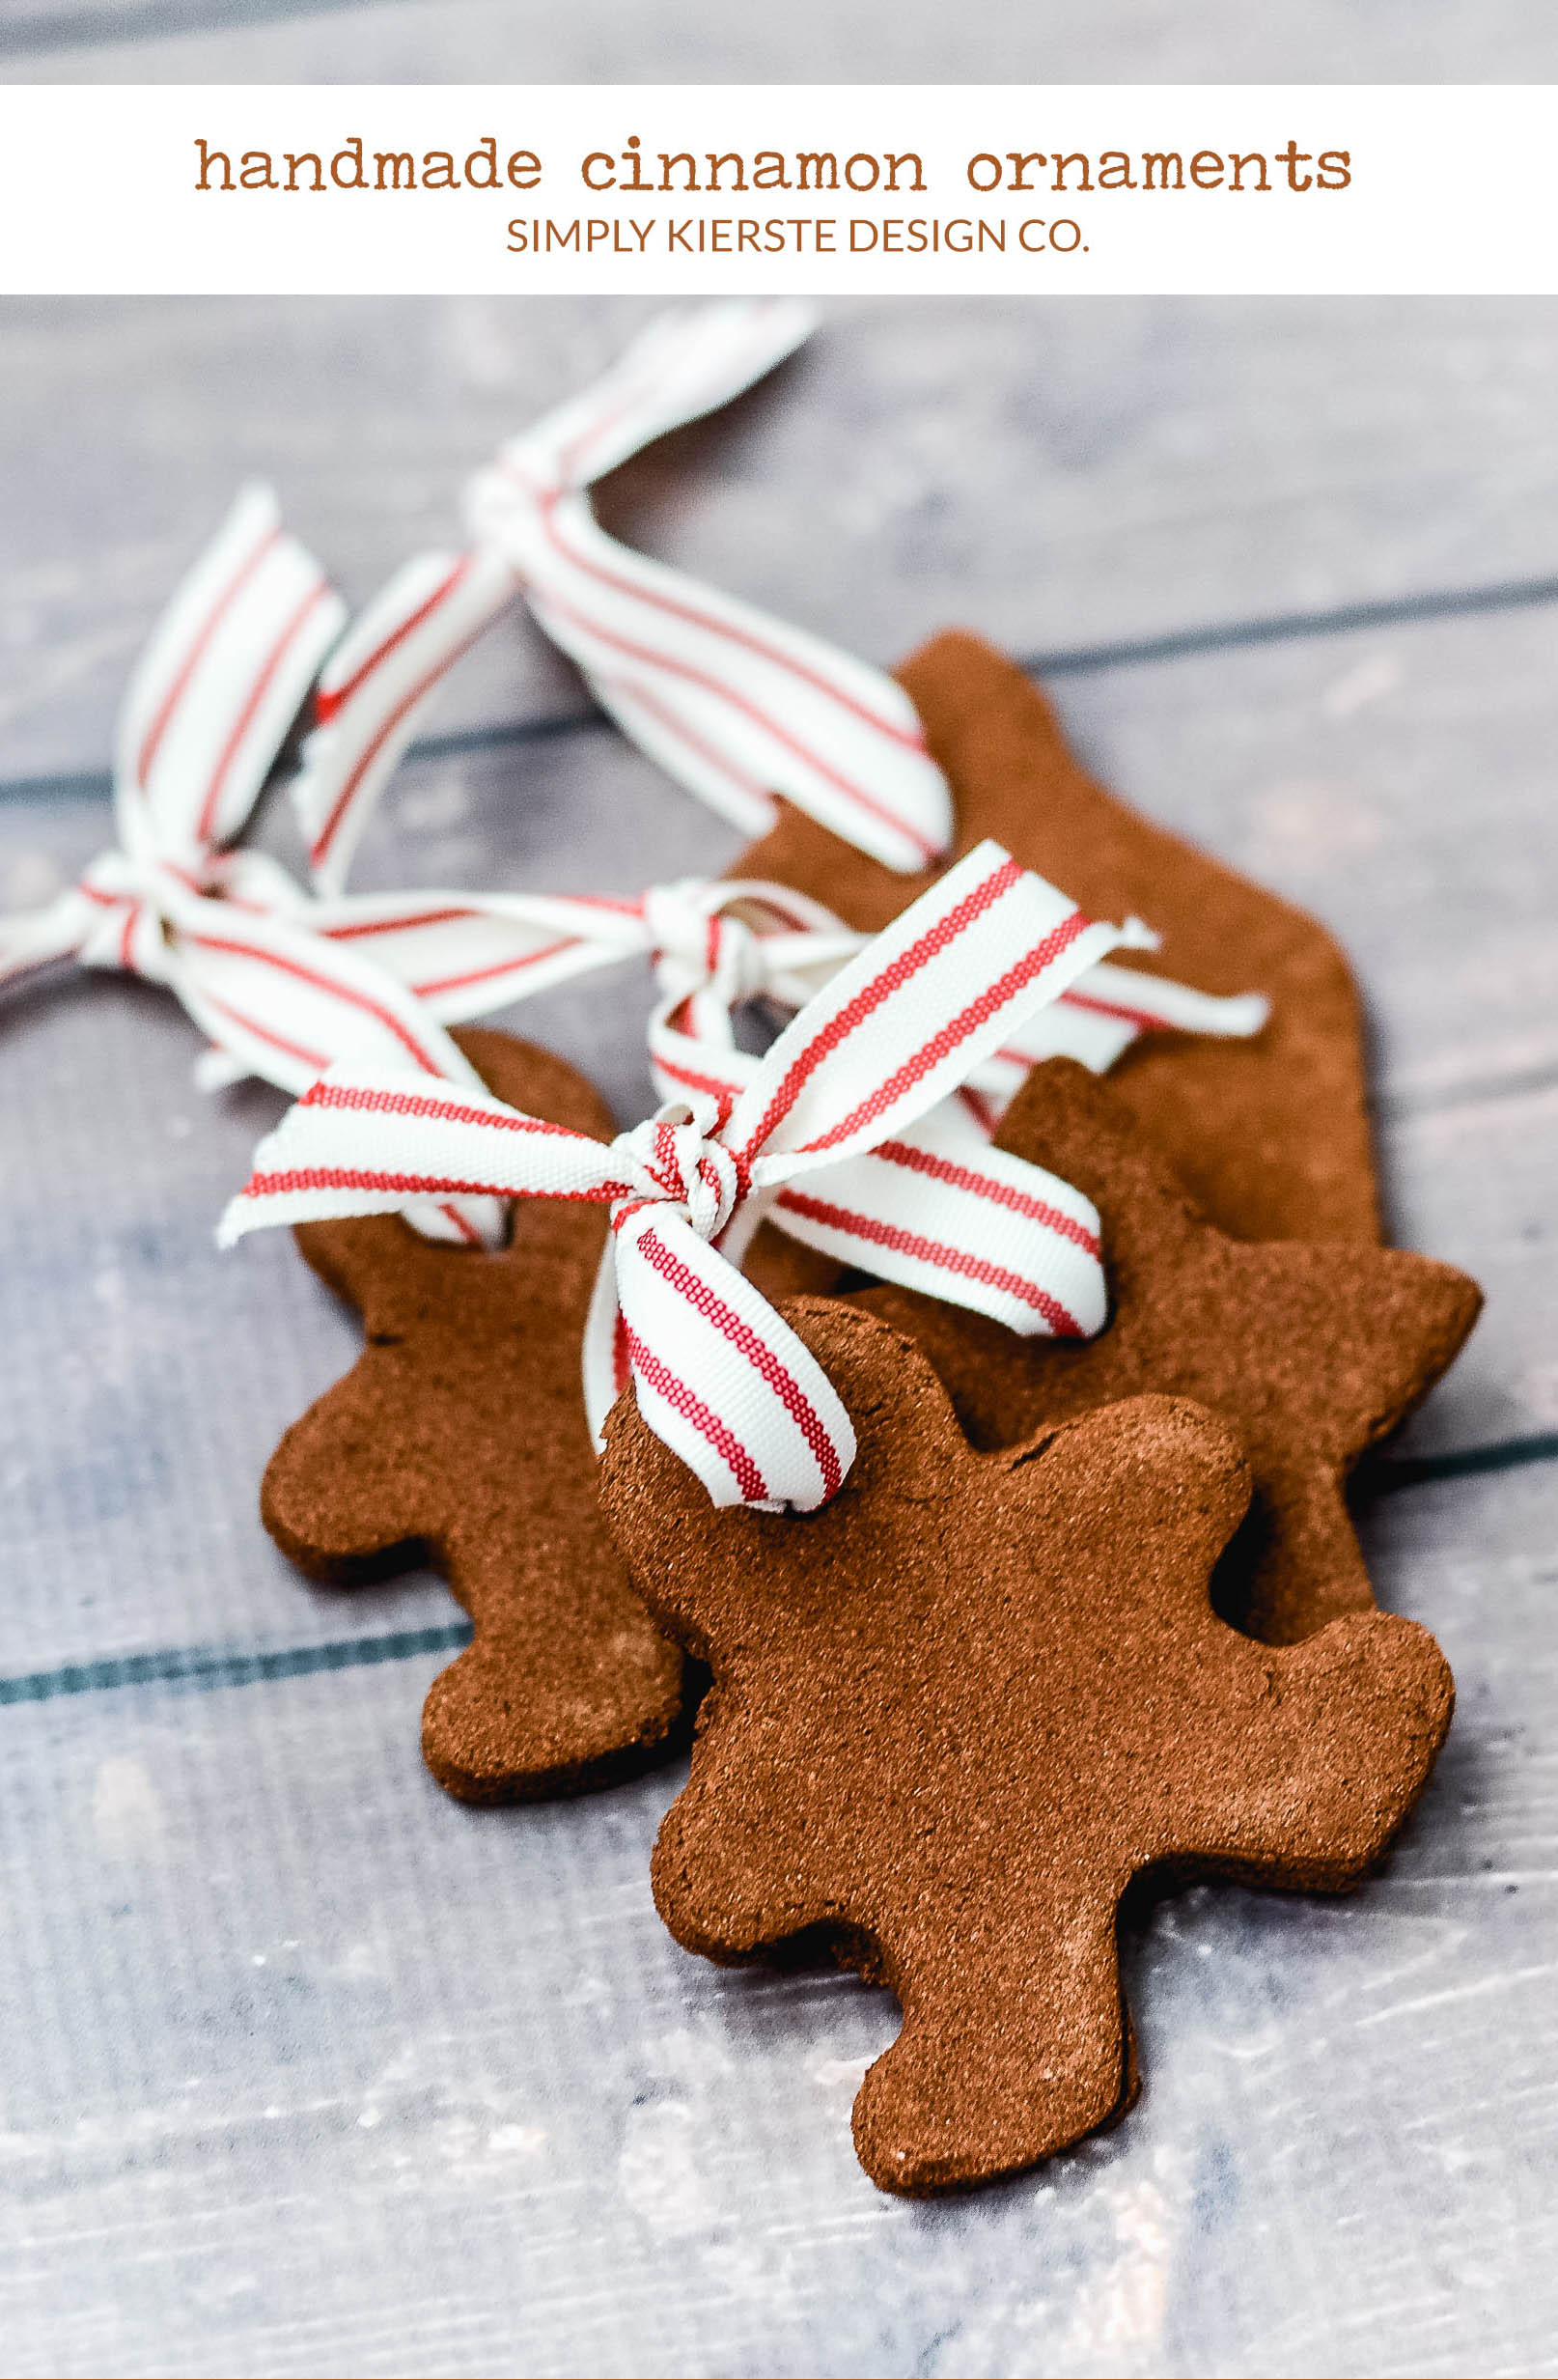 Easy Handmade Cinnamon Ornaments | Christmas Ornaments | simplykierste.com #handmadeornaments #diyornaments #easychristmasideas